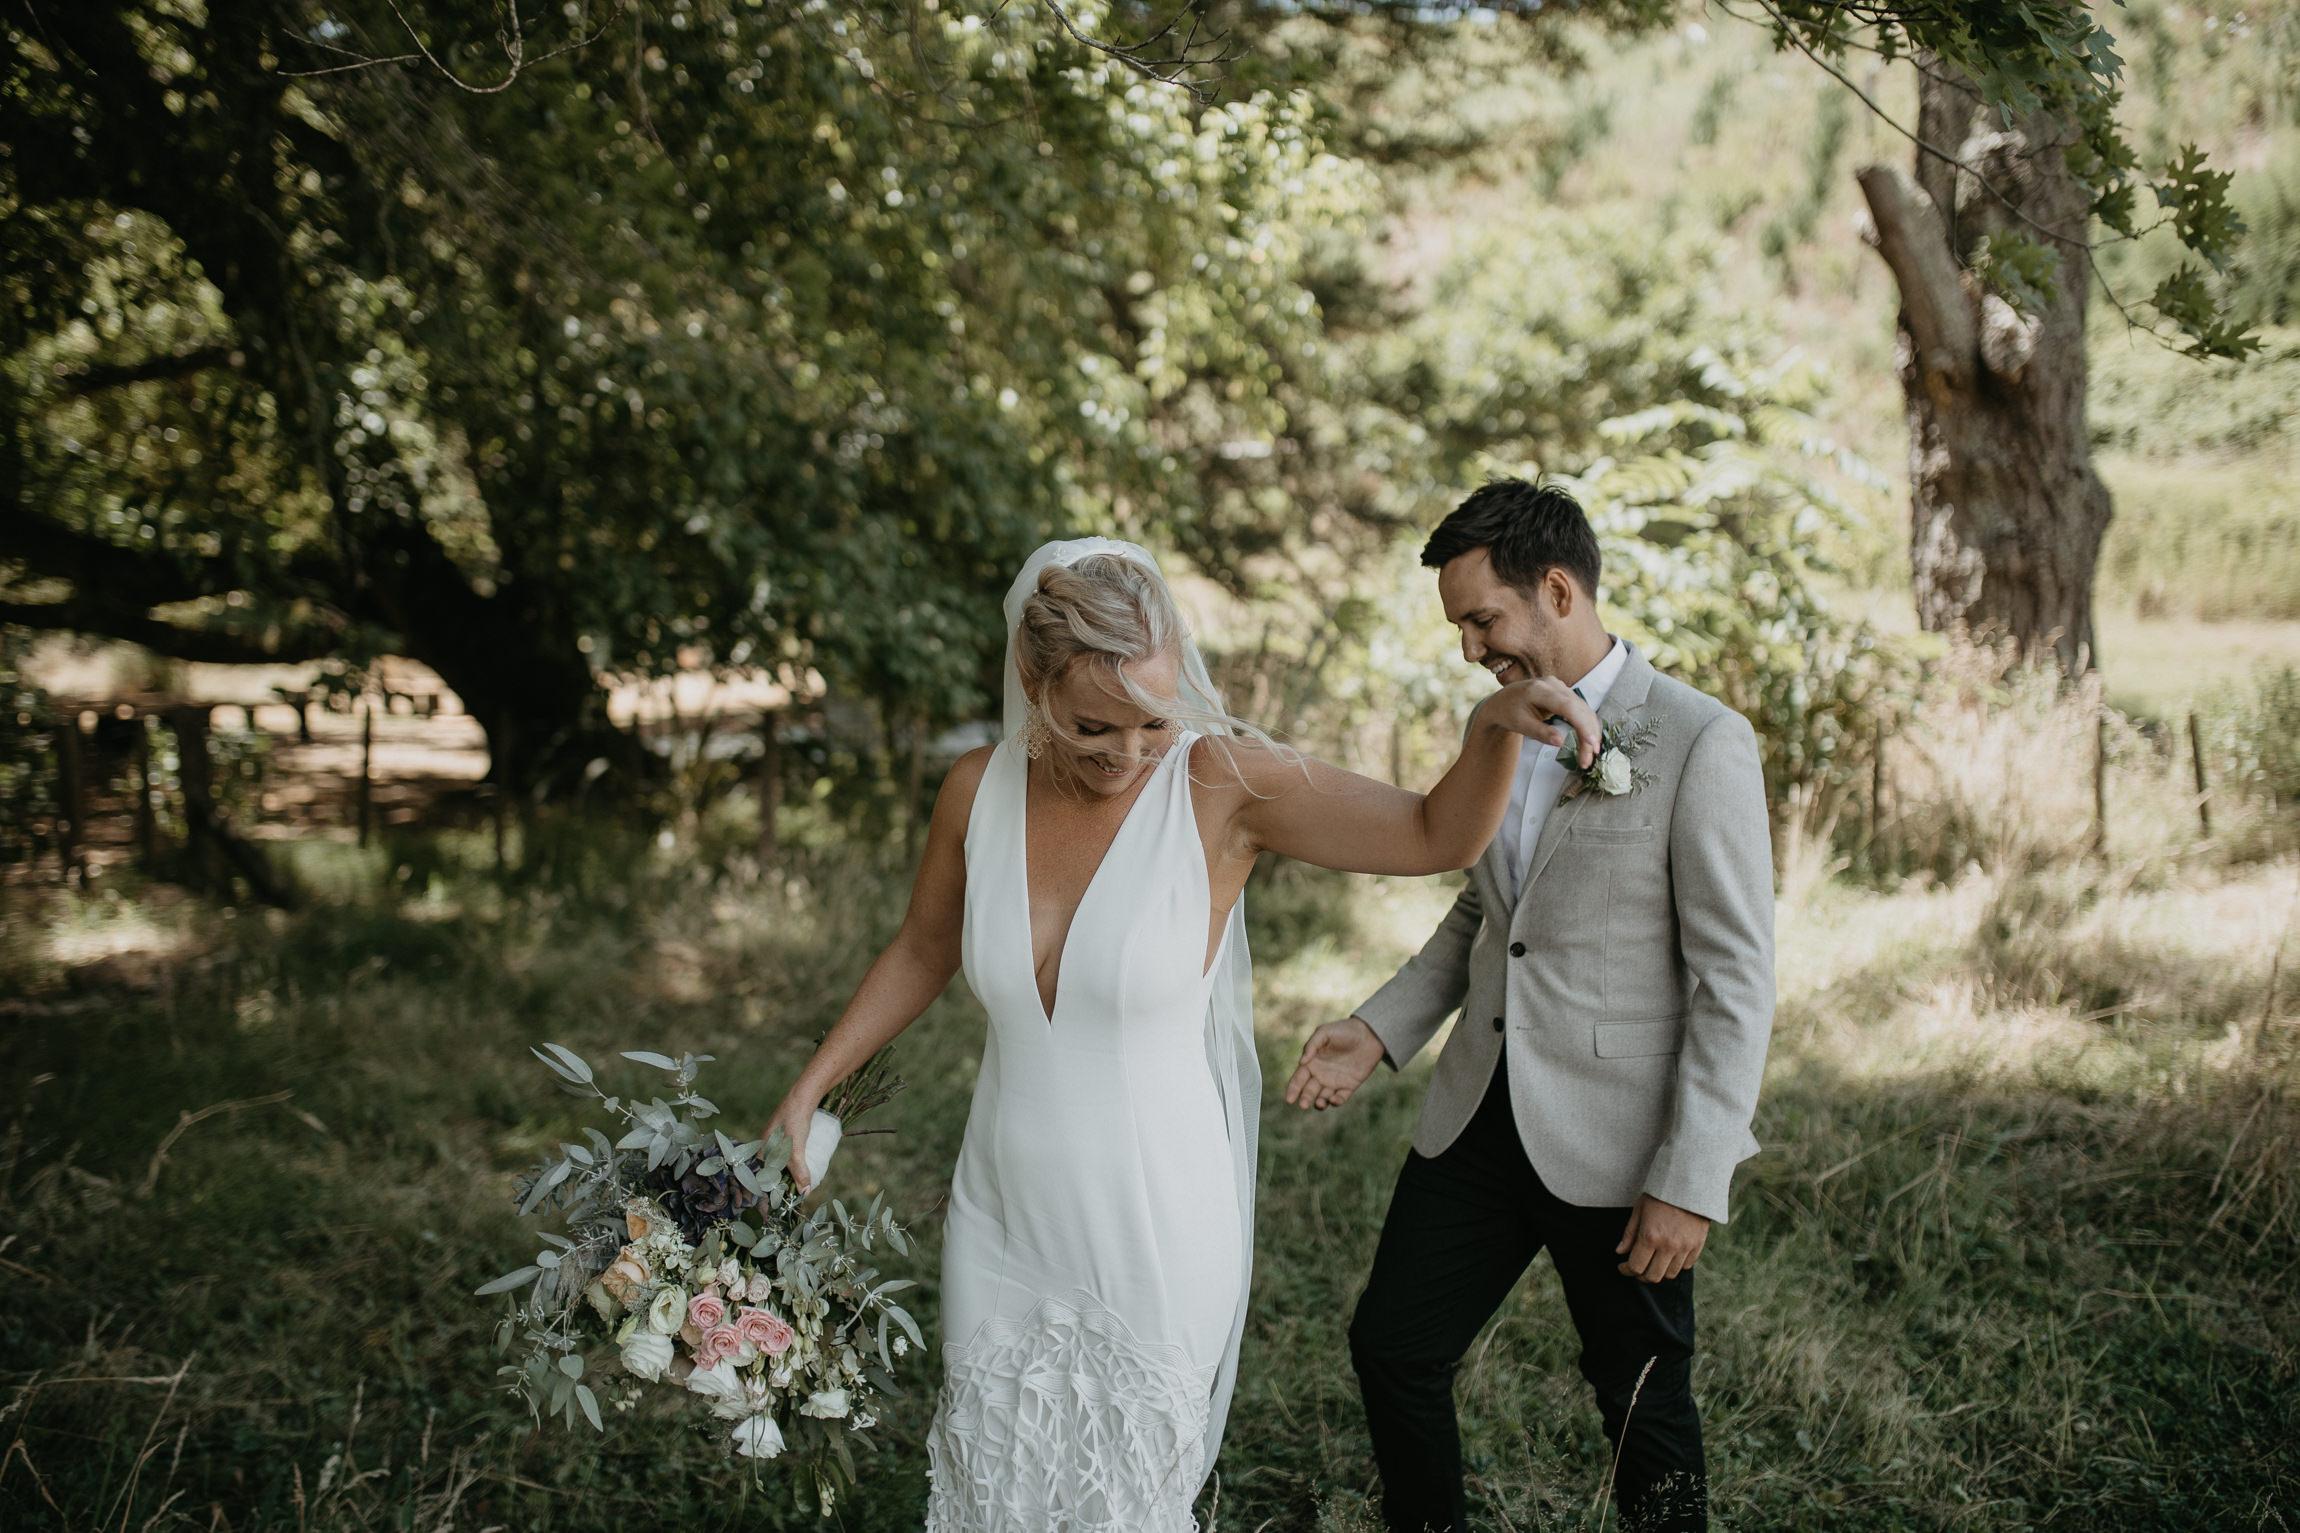 oldforestschool-wedding-blog-56.jpg